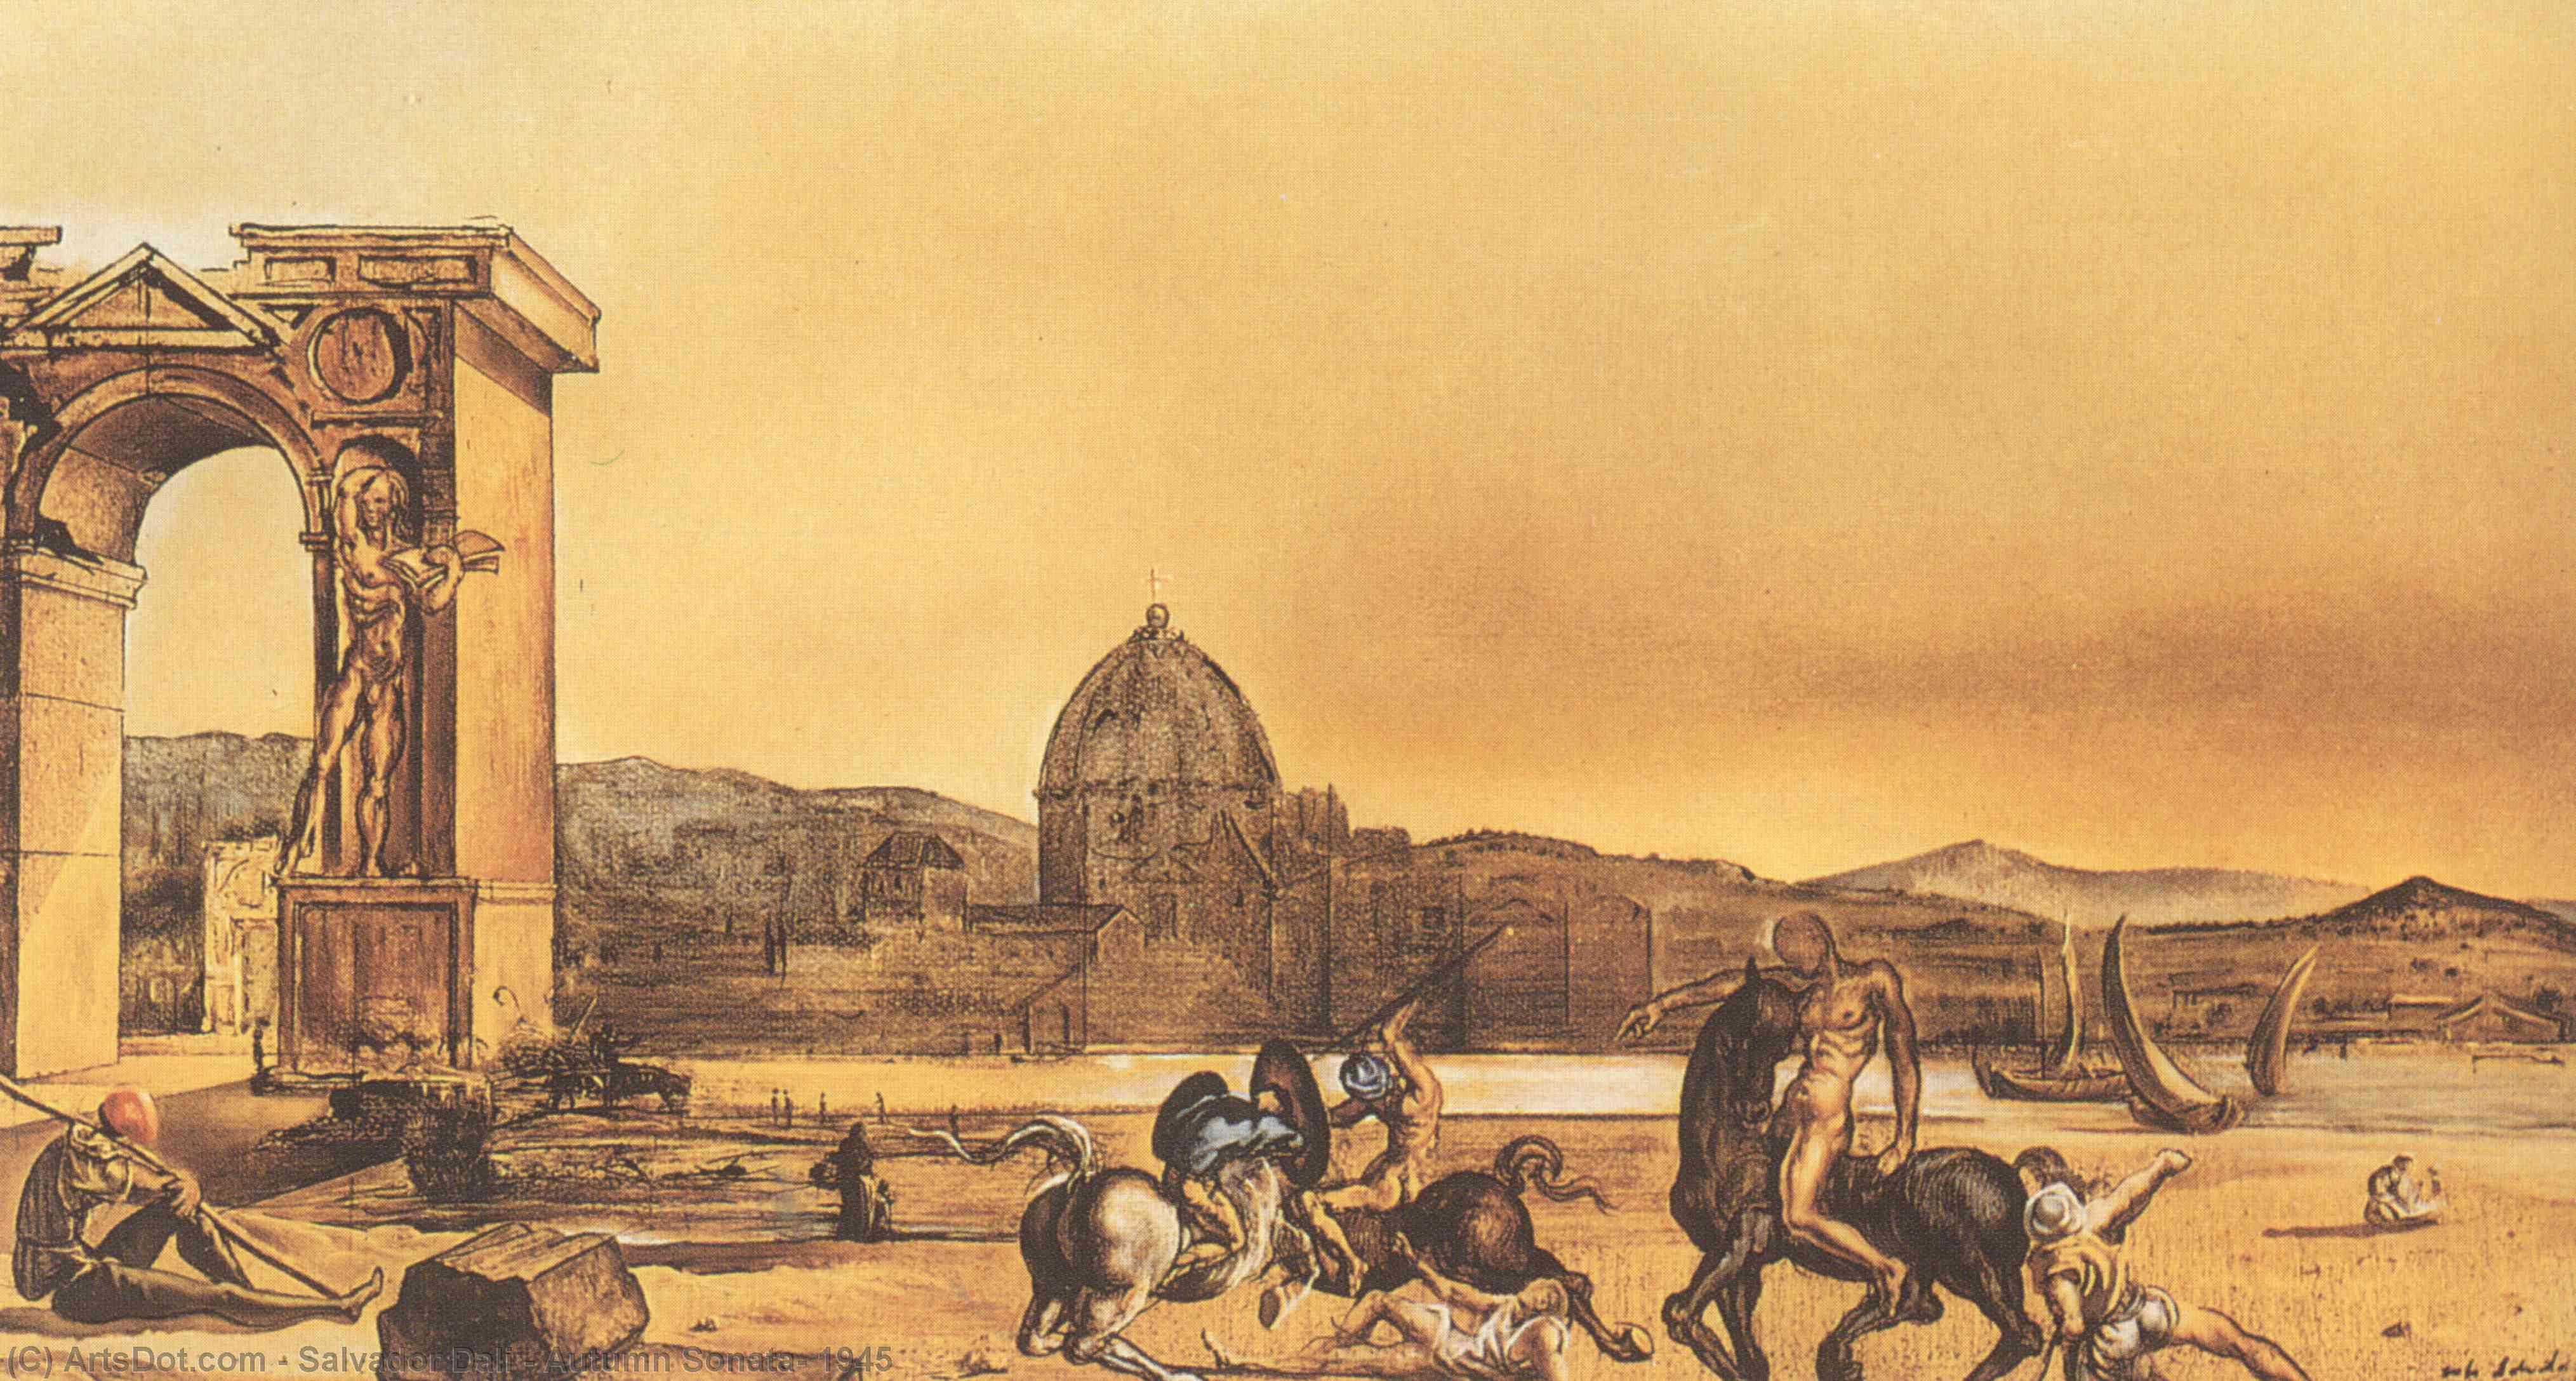 Wikioo.org - The Encyclopedia of Fine Arts - Painting, Artwork by Salvador Dali - Autumn Sonata, 1945